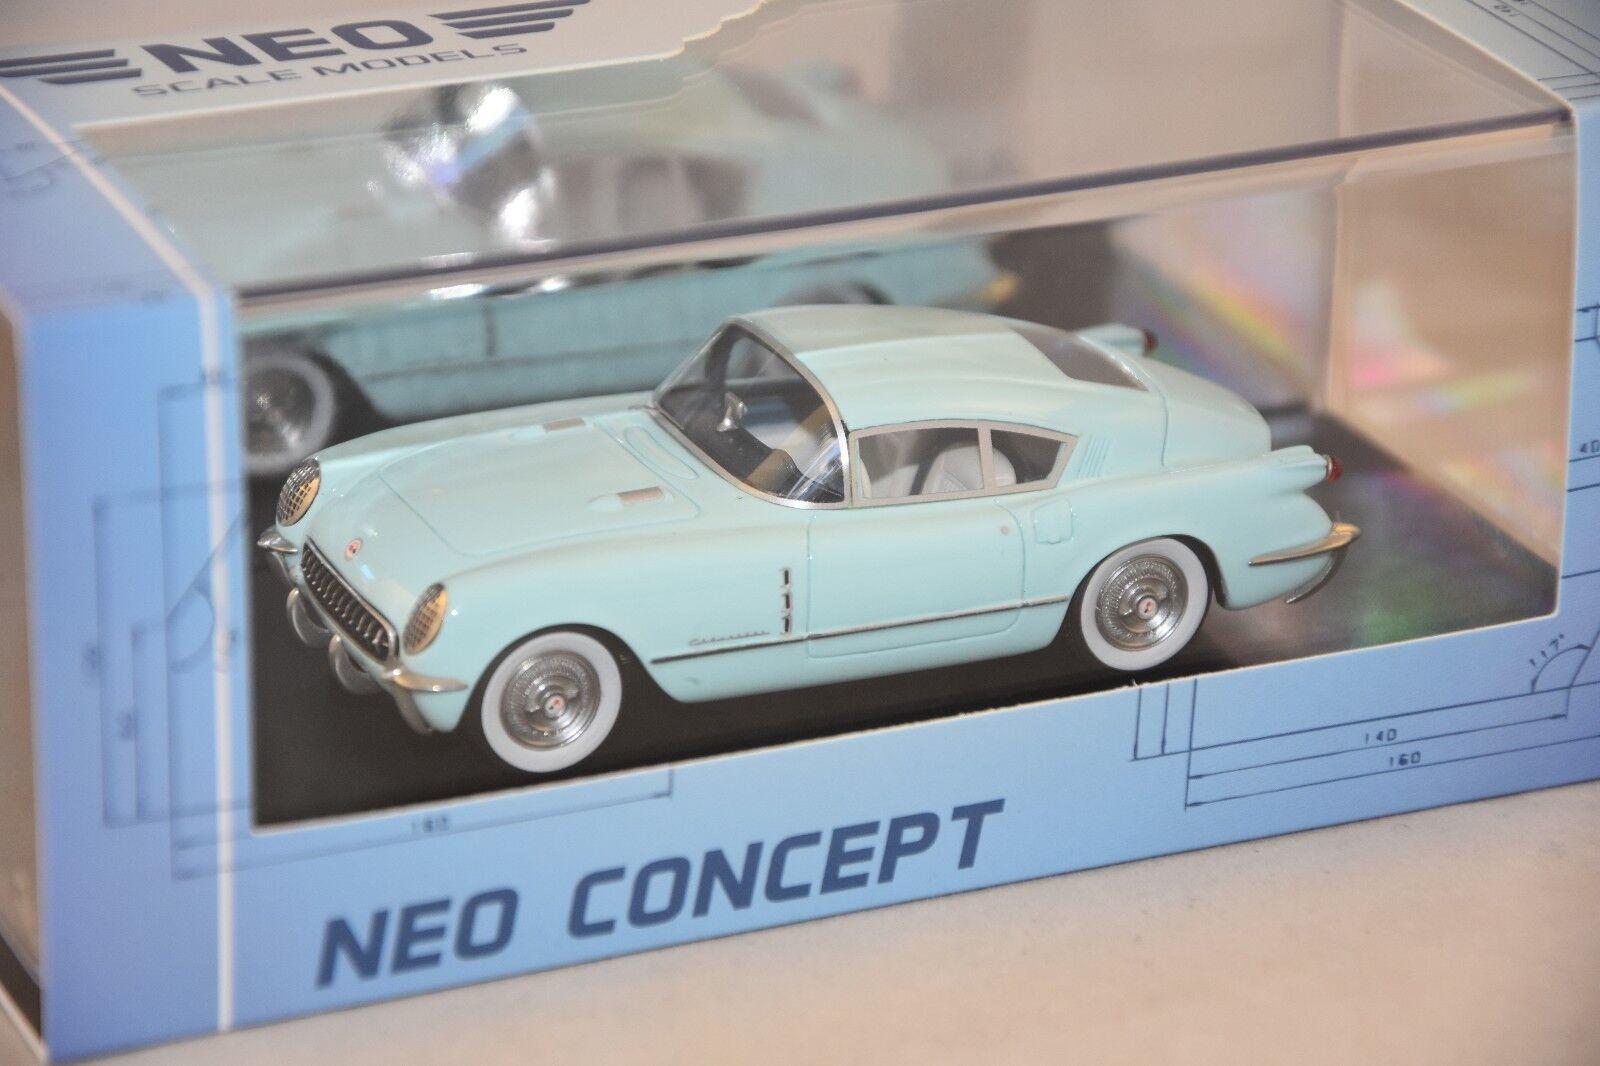 NEO 47160 - Chevrolet Corvette Corvair -konceptet blå clair - 1954 1  43